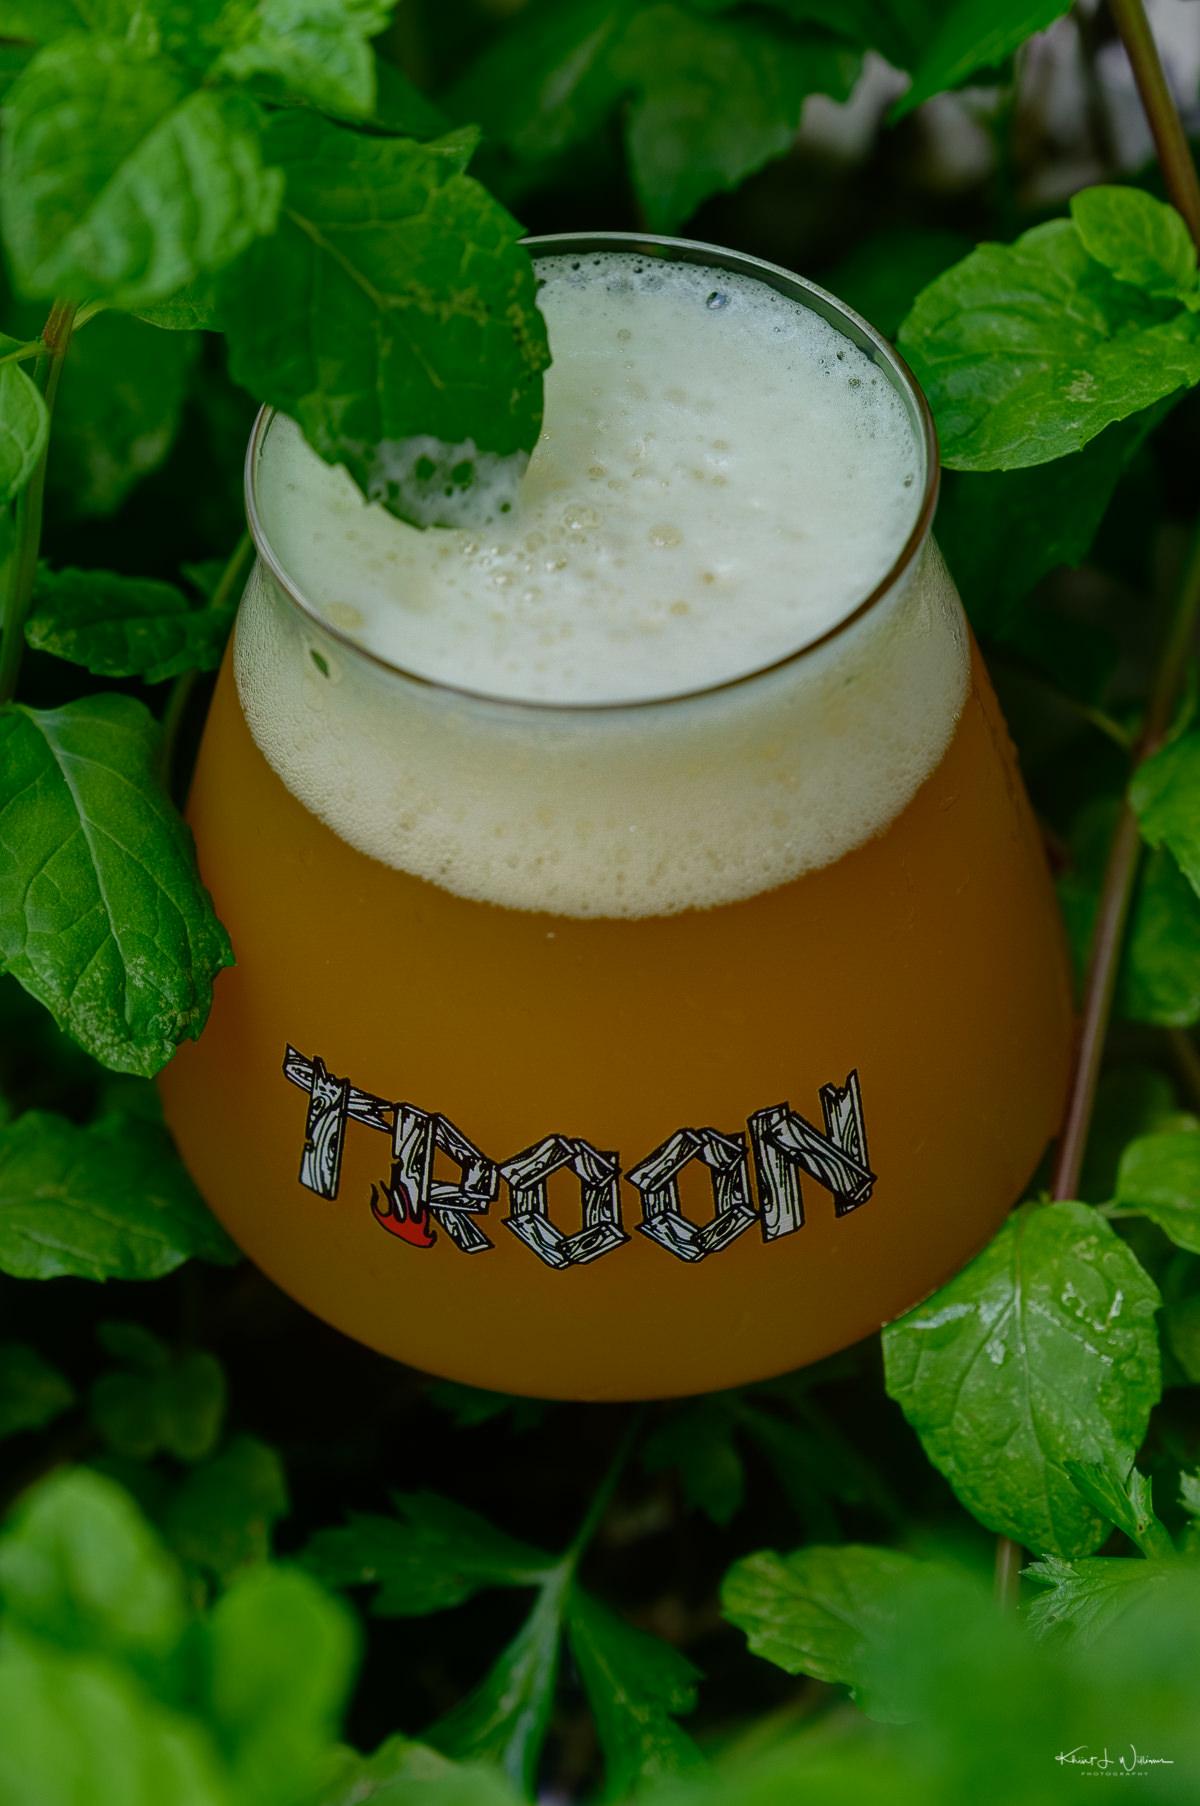 Troon, Beer, Craft Ale, Mint, Glass, Teku